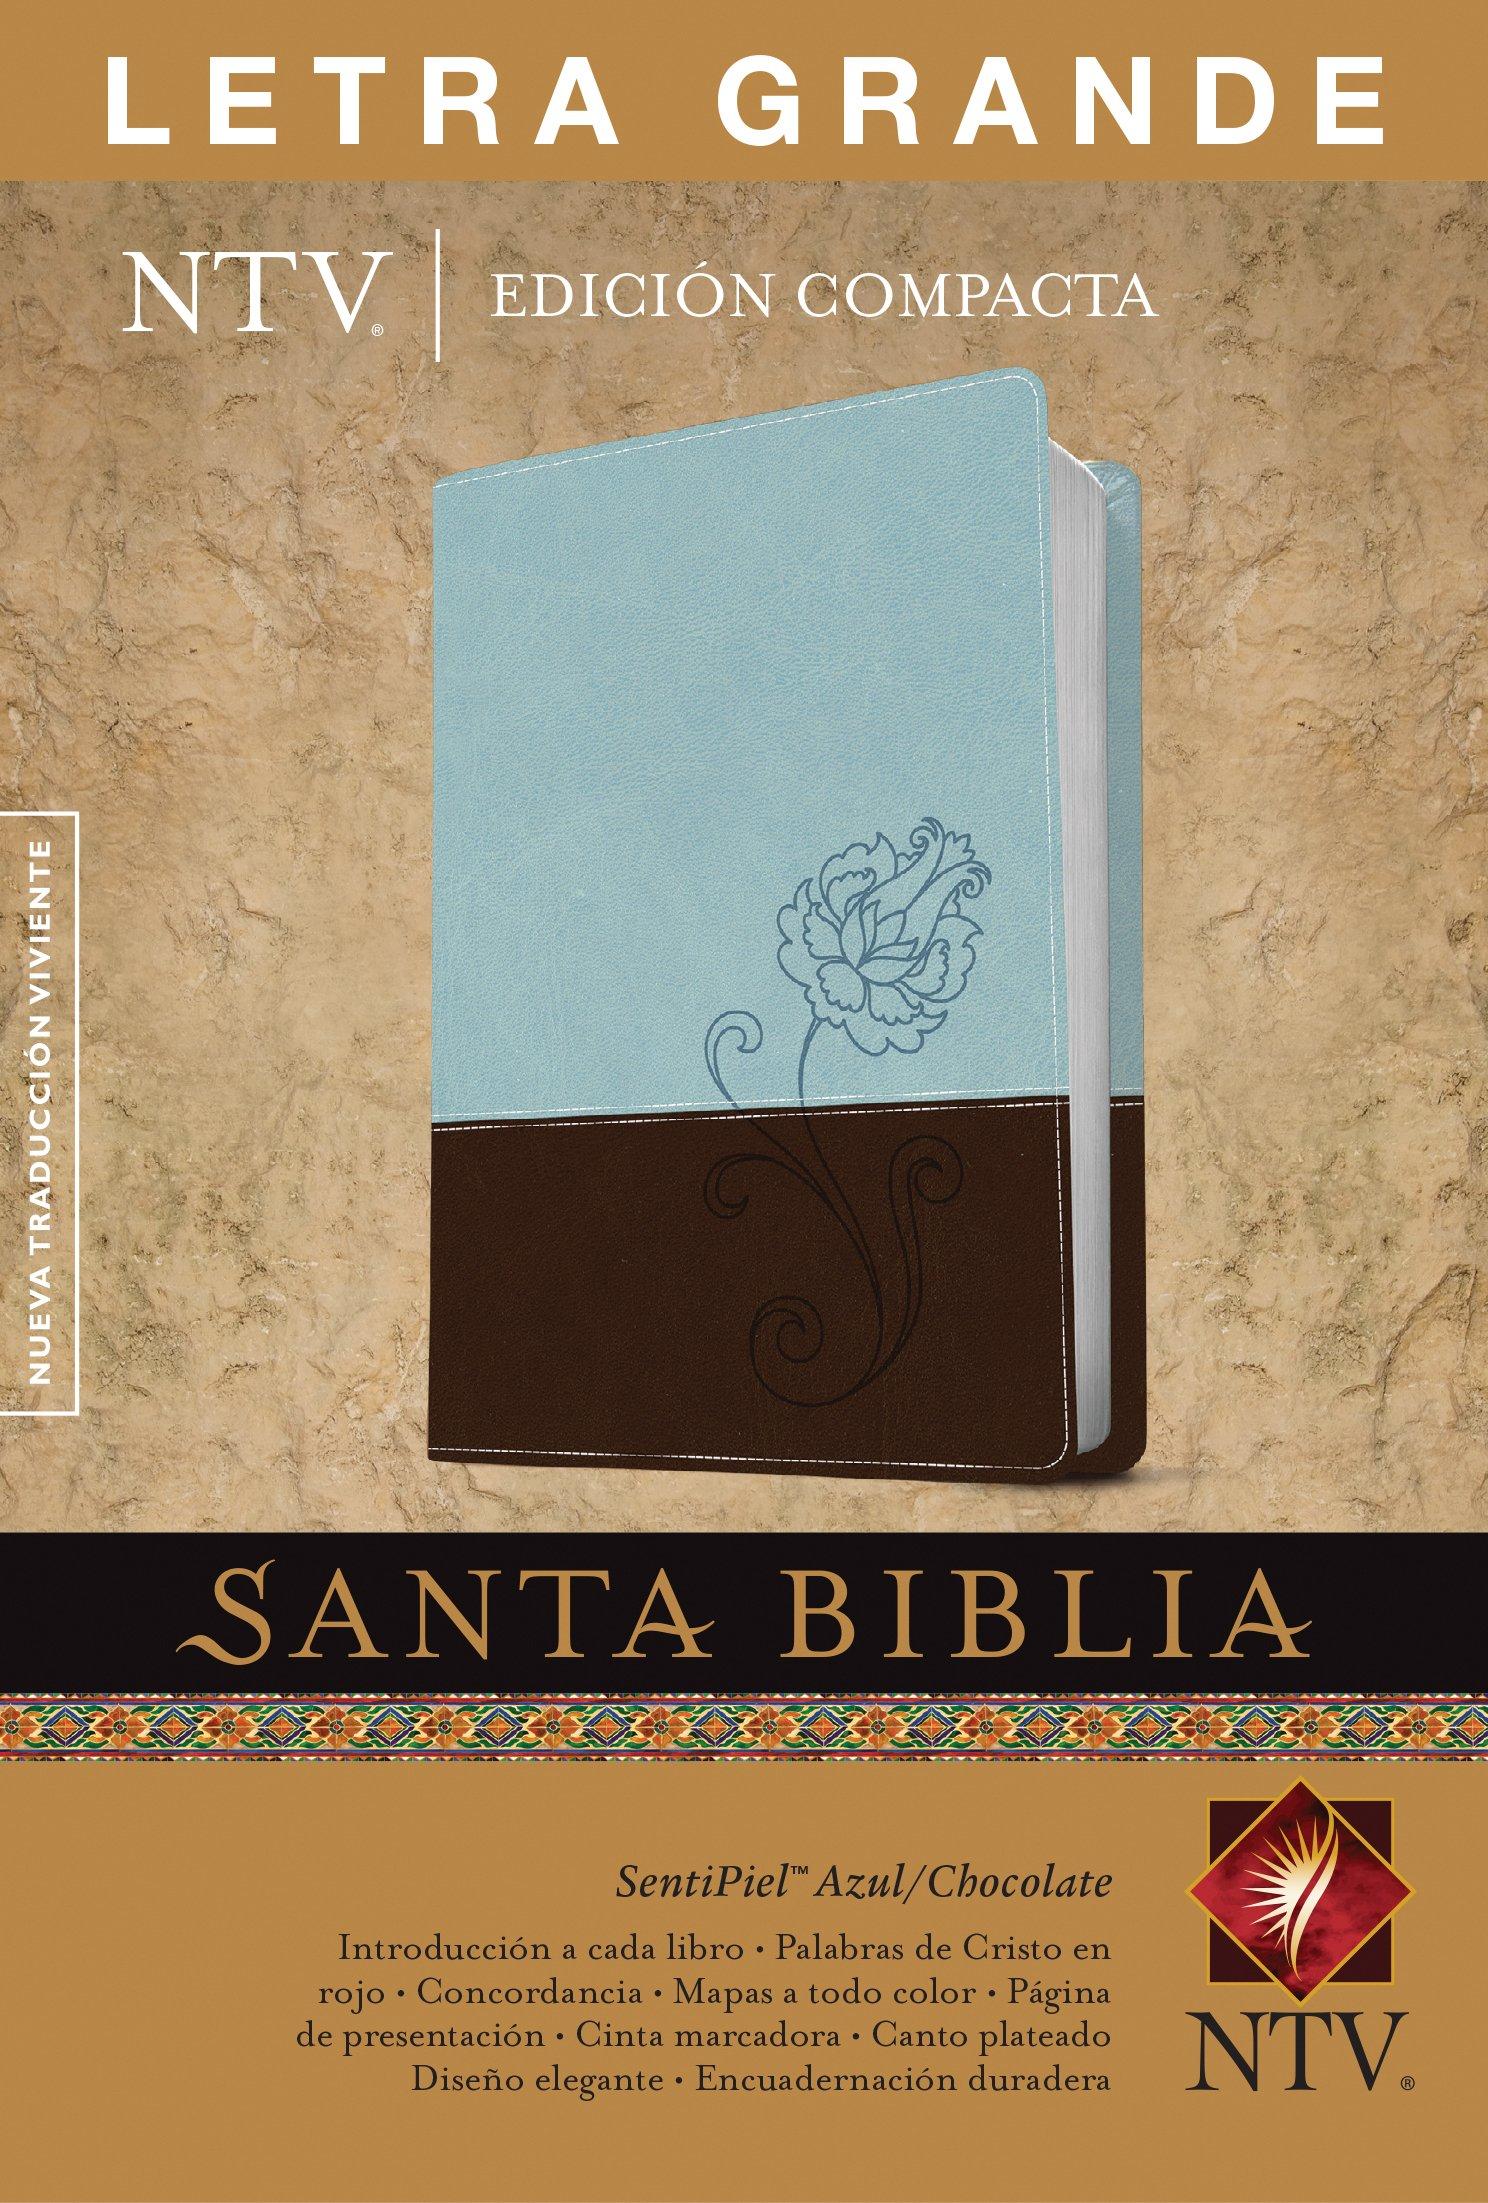 Biblia NTV Edición compacta,  Letra grande